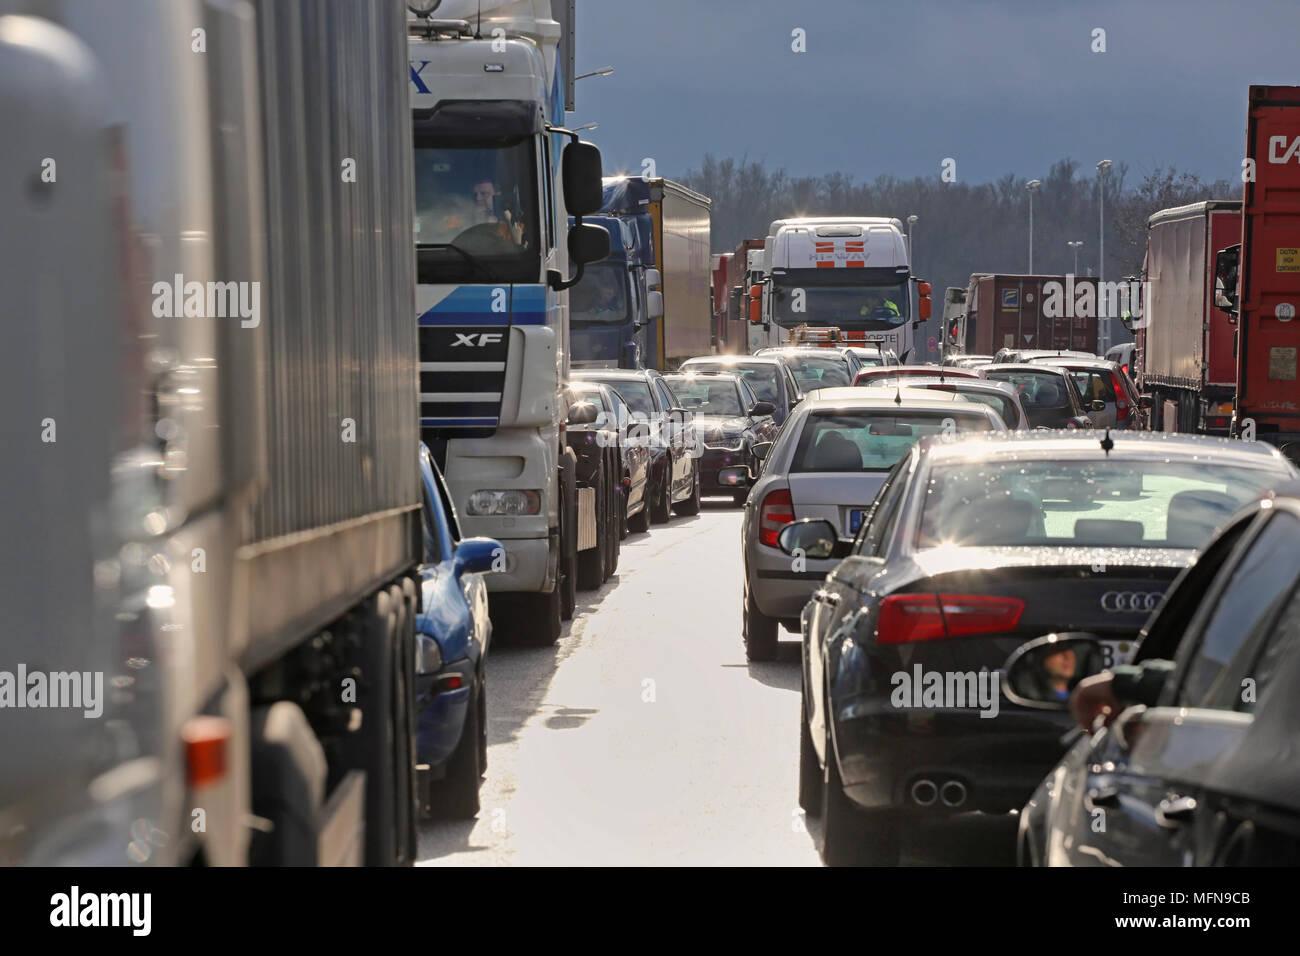 traffic jam with lorries - Stock Image